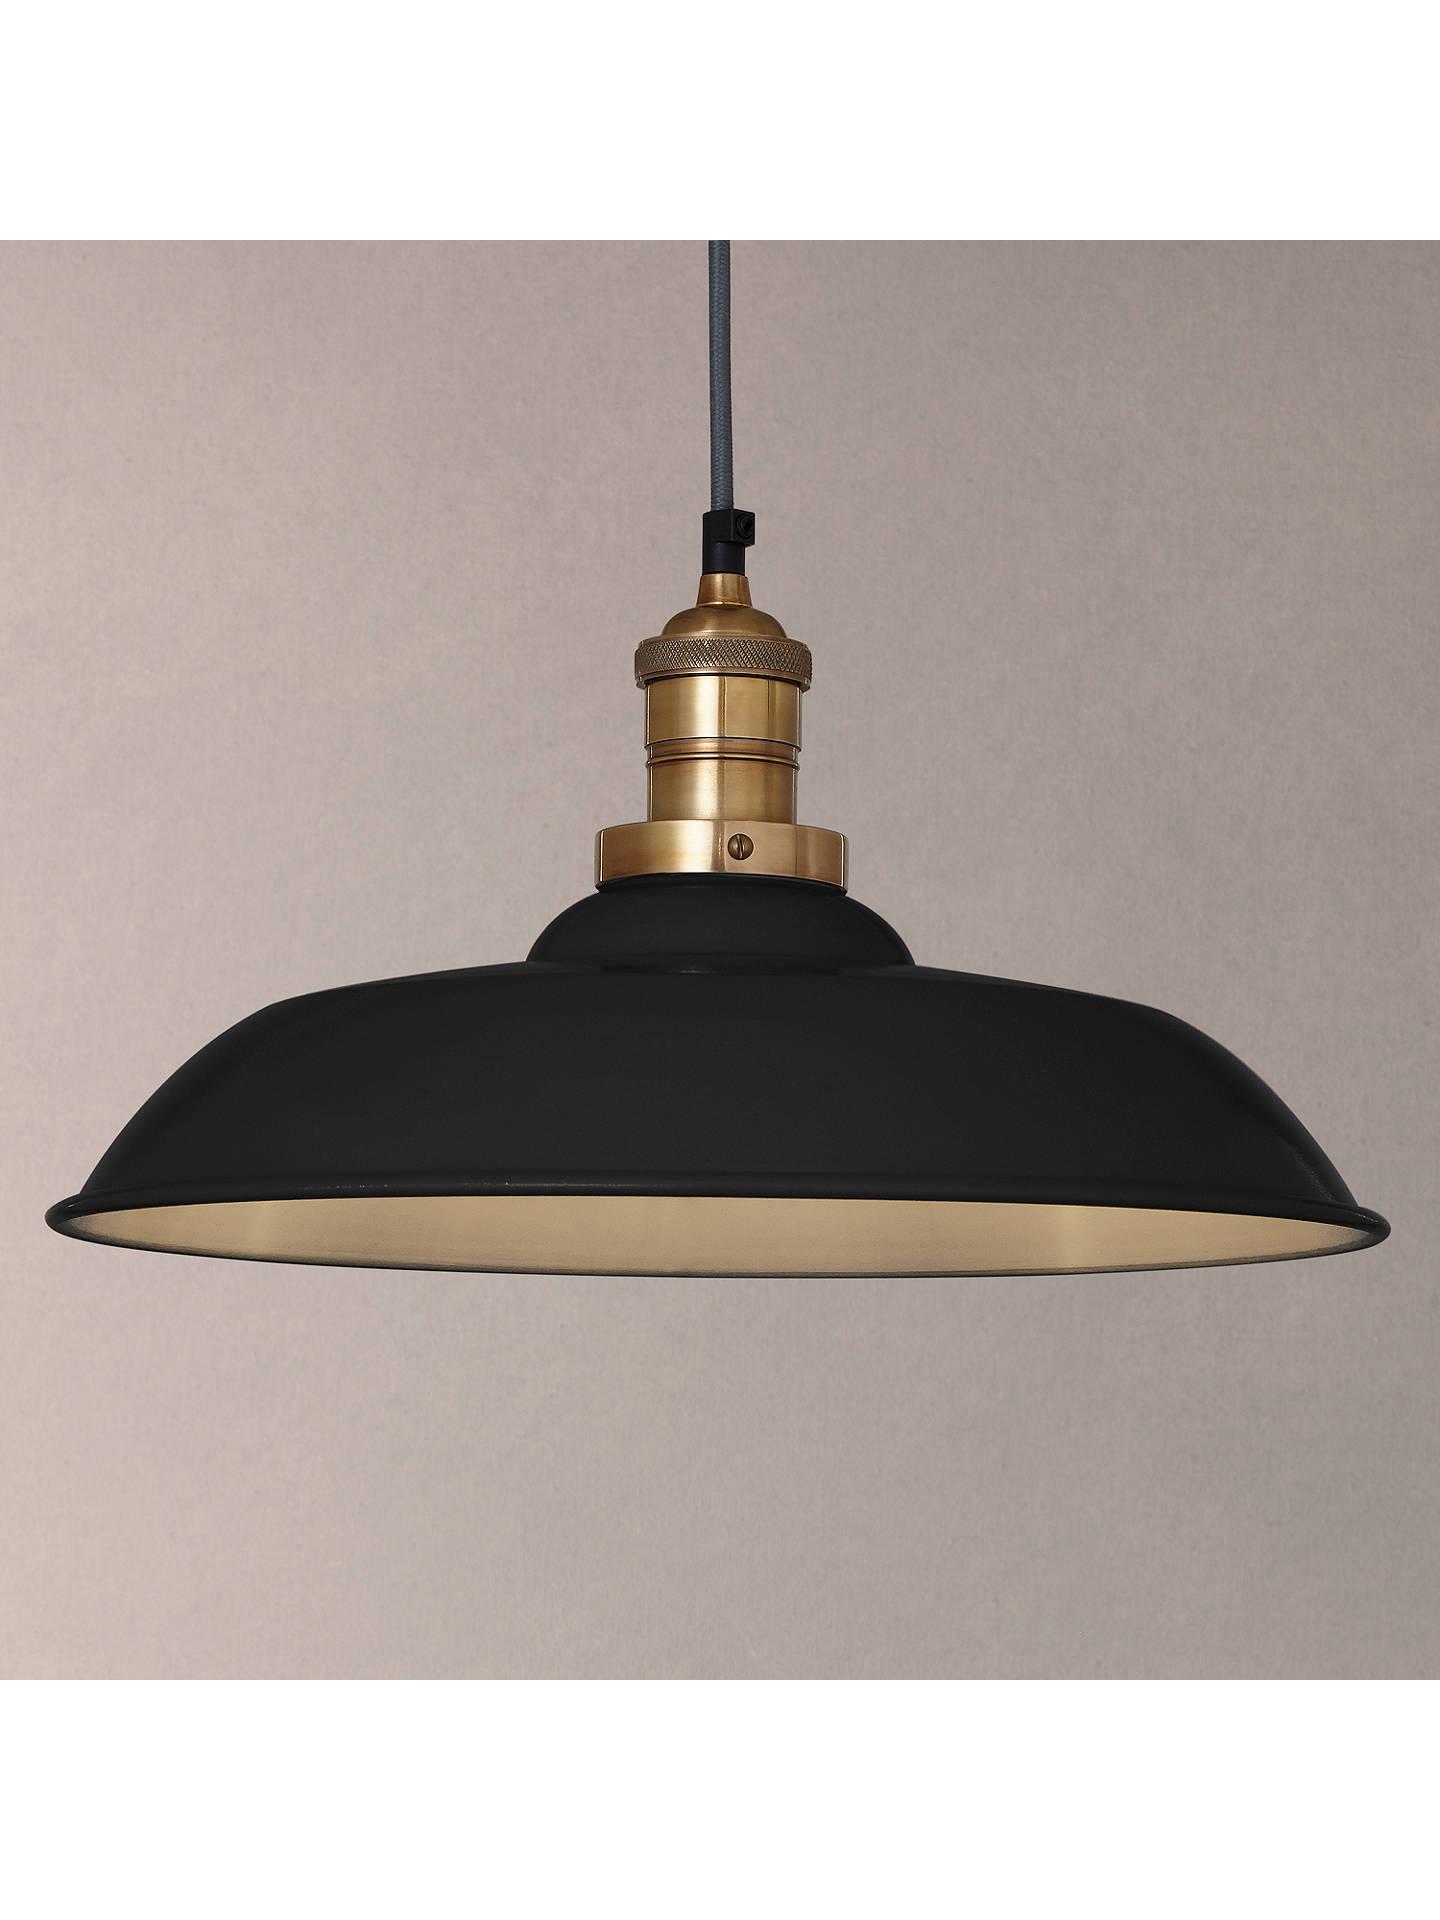 Croft Collection Clyde Br Trim Ceiling Pendant Light Black